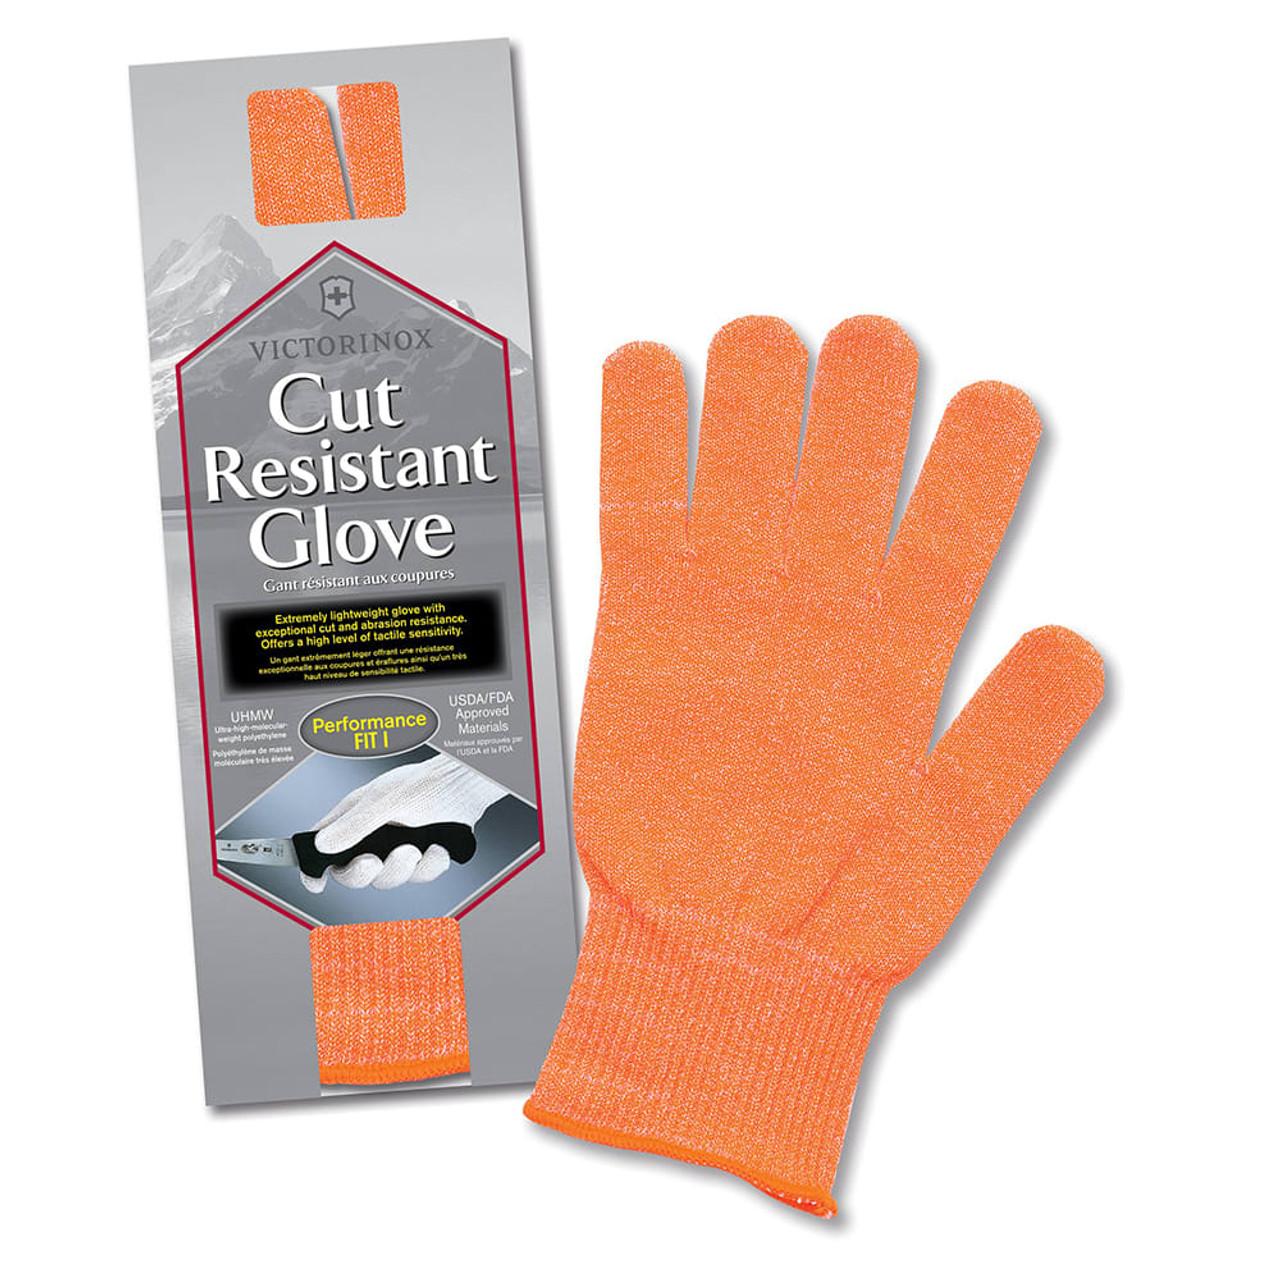 "Victorinox - Cut Resistant Glove  ""Orange"" - One Size Fits Most - 7.9048.9"